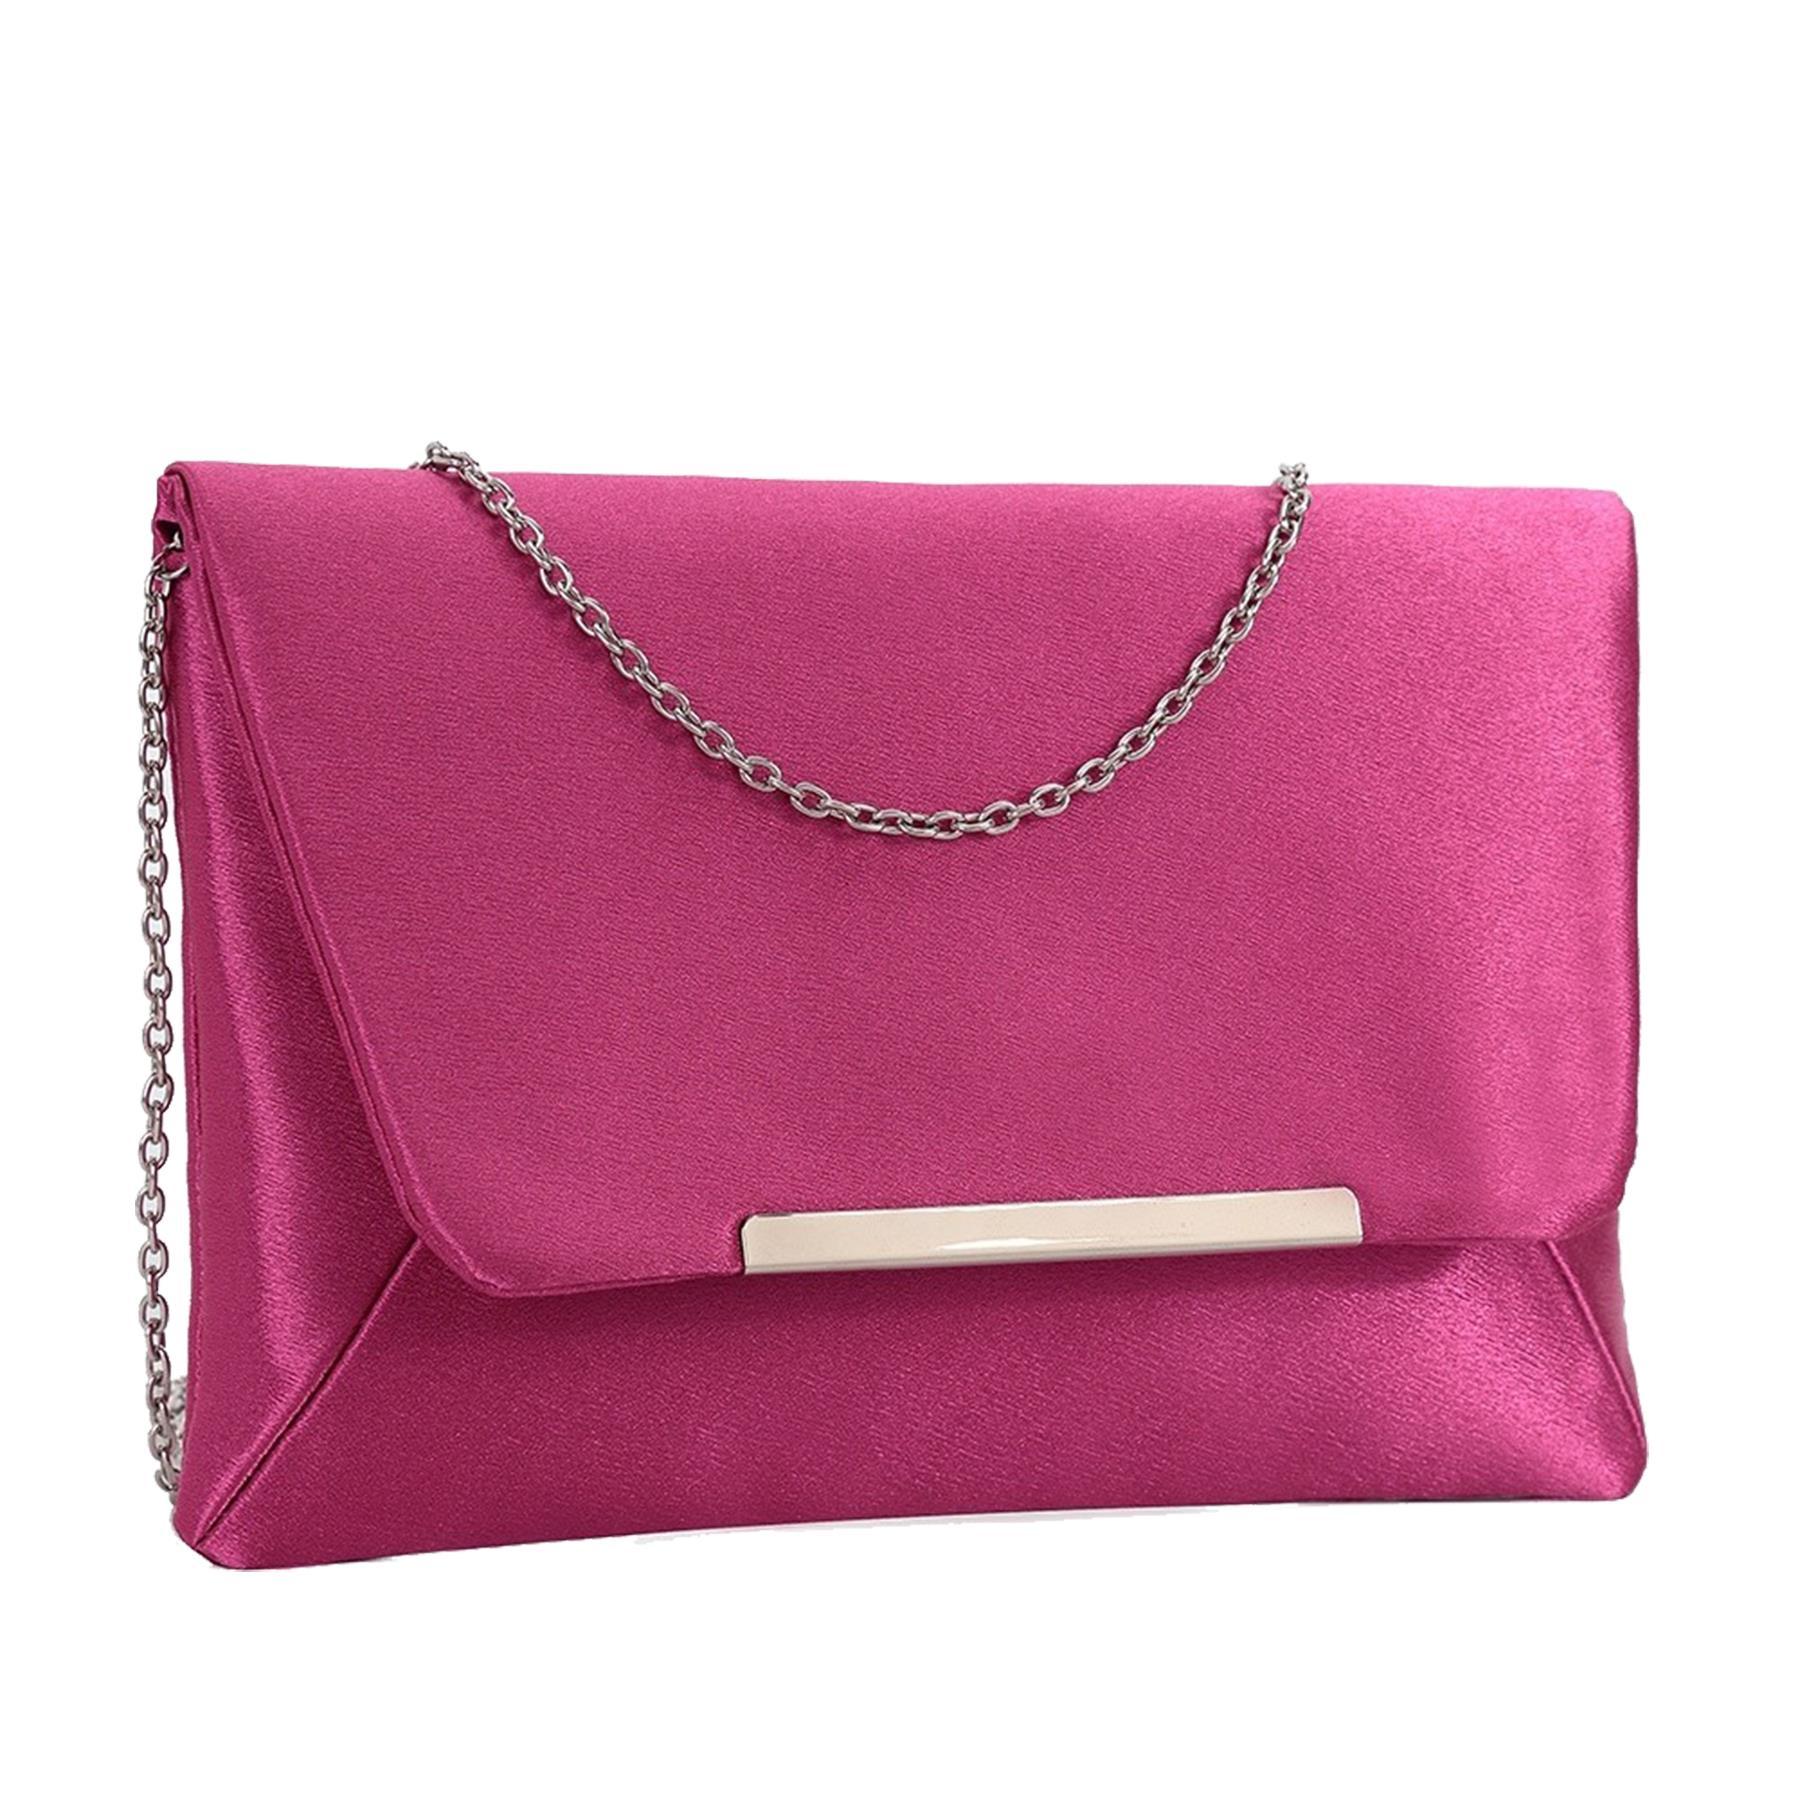 New-Ladies-Satin-Envelope-Metallic-Trim-Bridal-Wedding-Prom-Clutch-Bag thumbnail 12